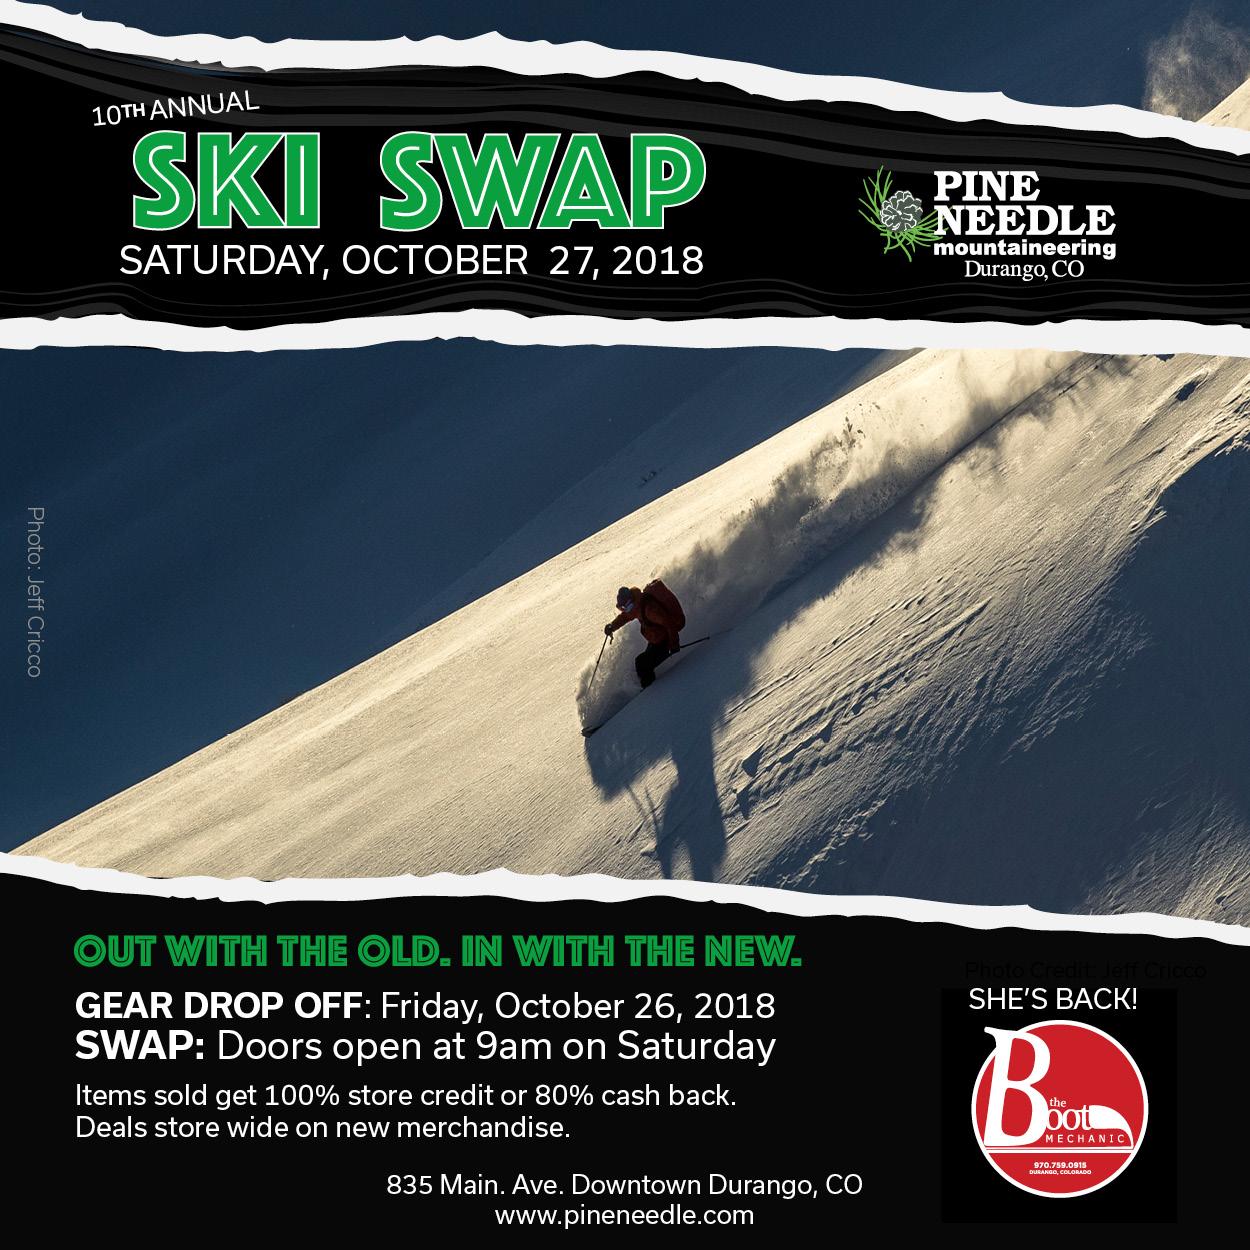 Email_600x400_Pine-Needle-Mountaineering-Ski Swap_101018.jpg